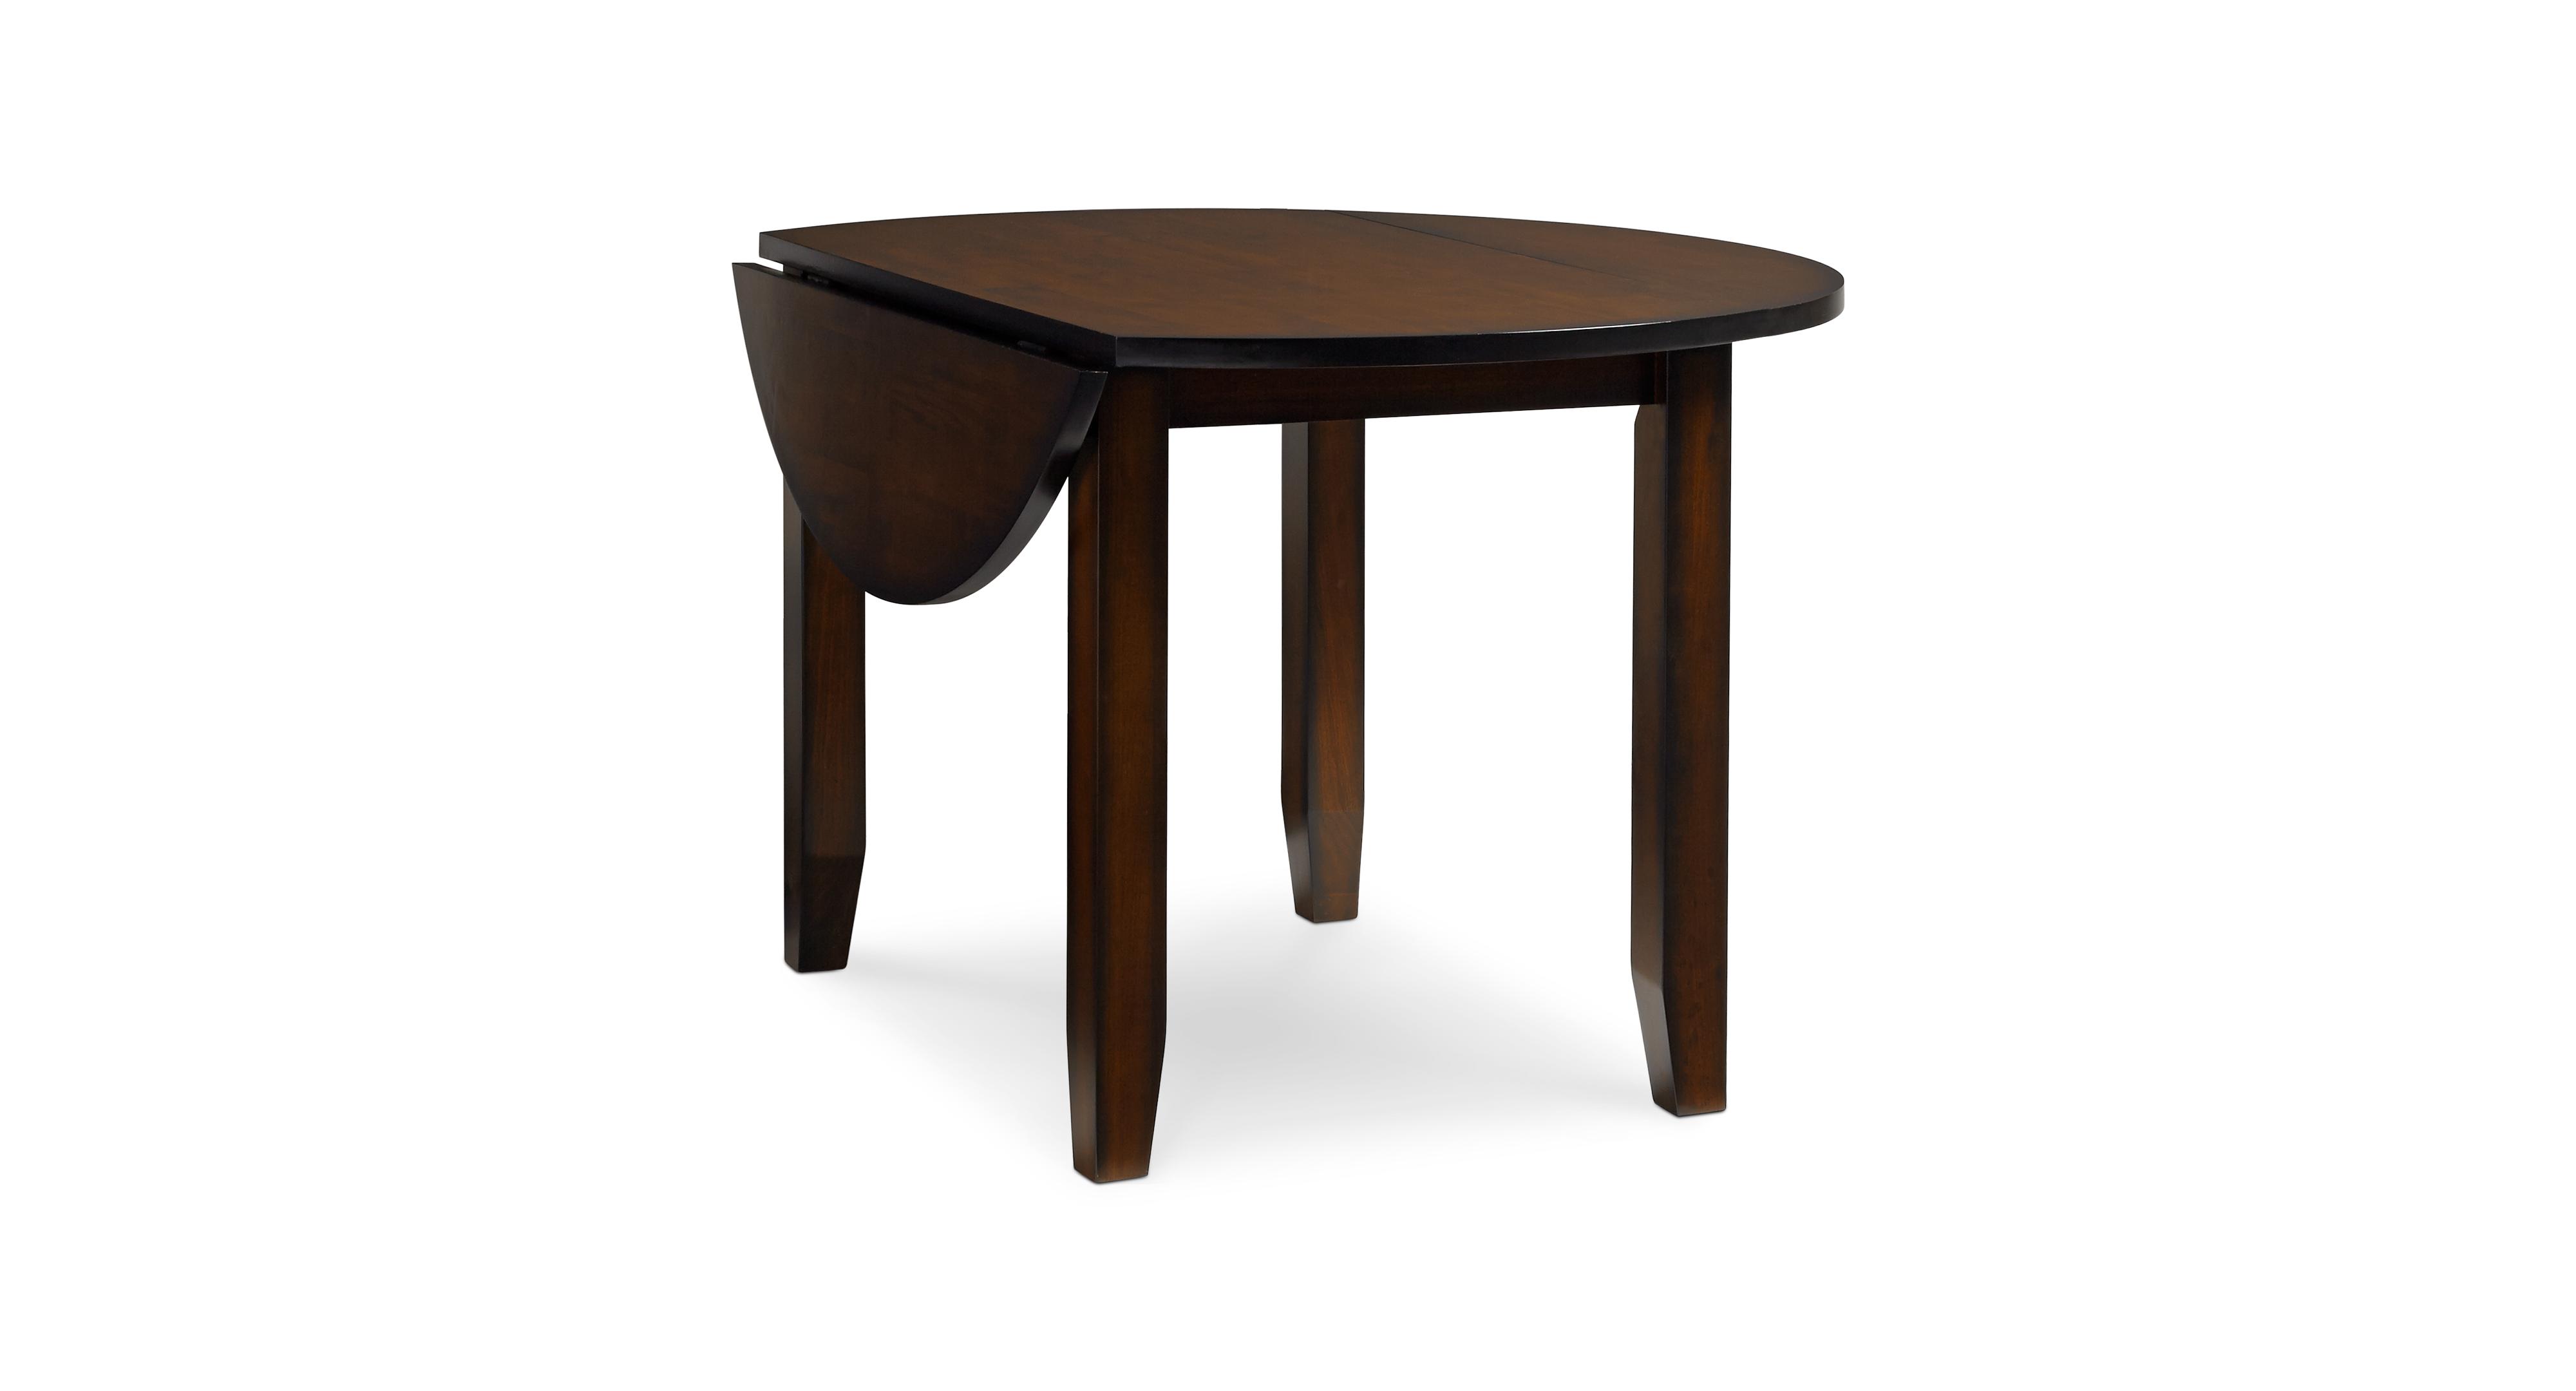 Branton Round Drop-Leaf Table